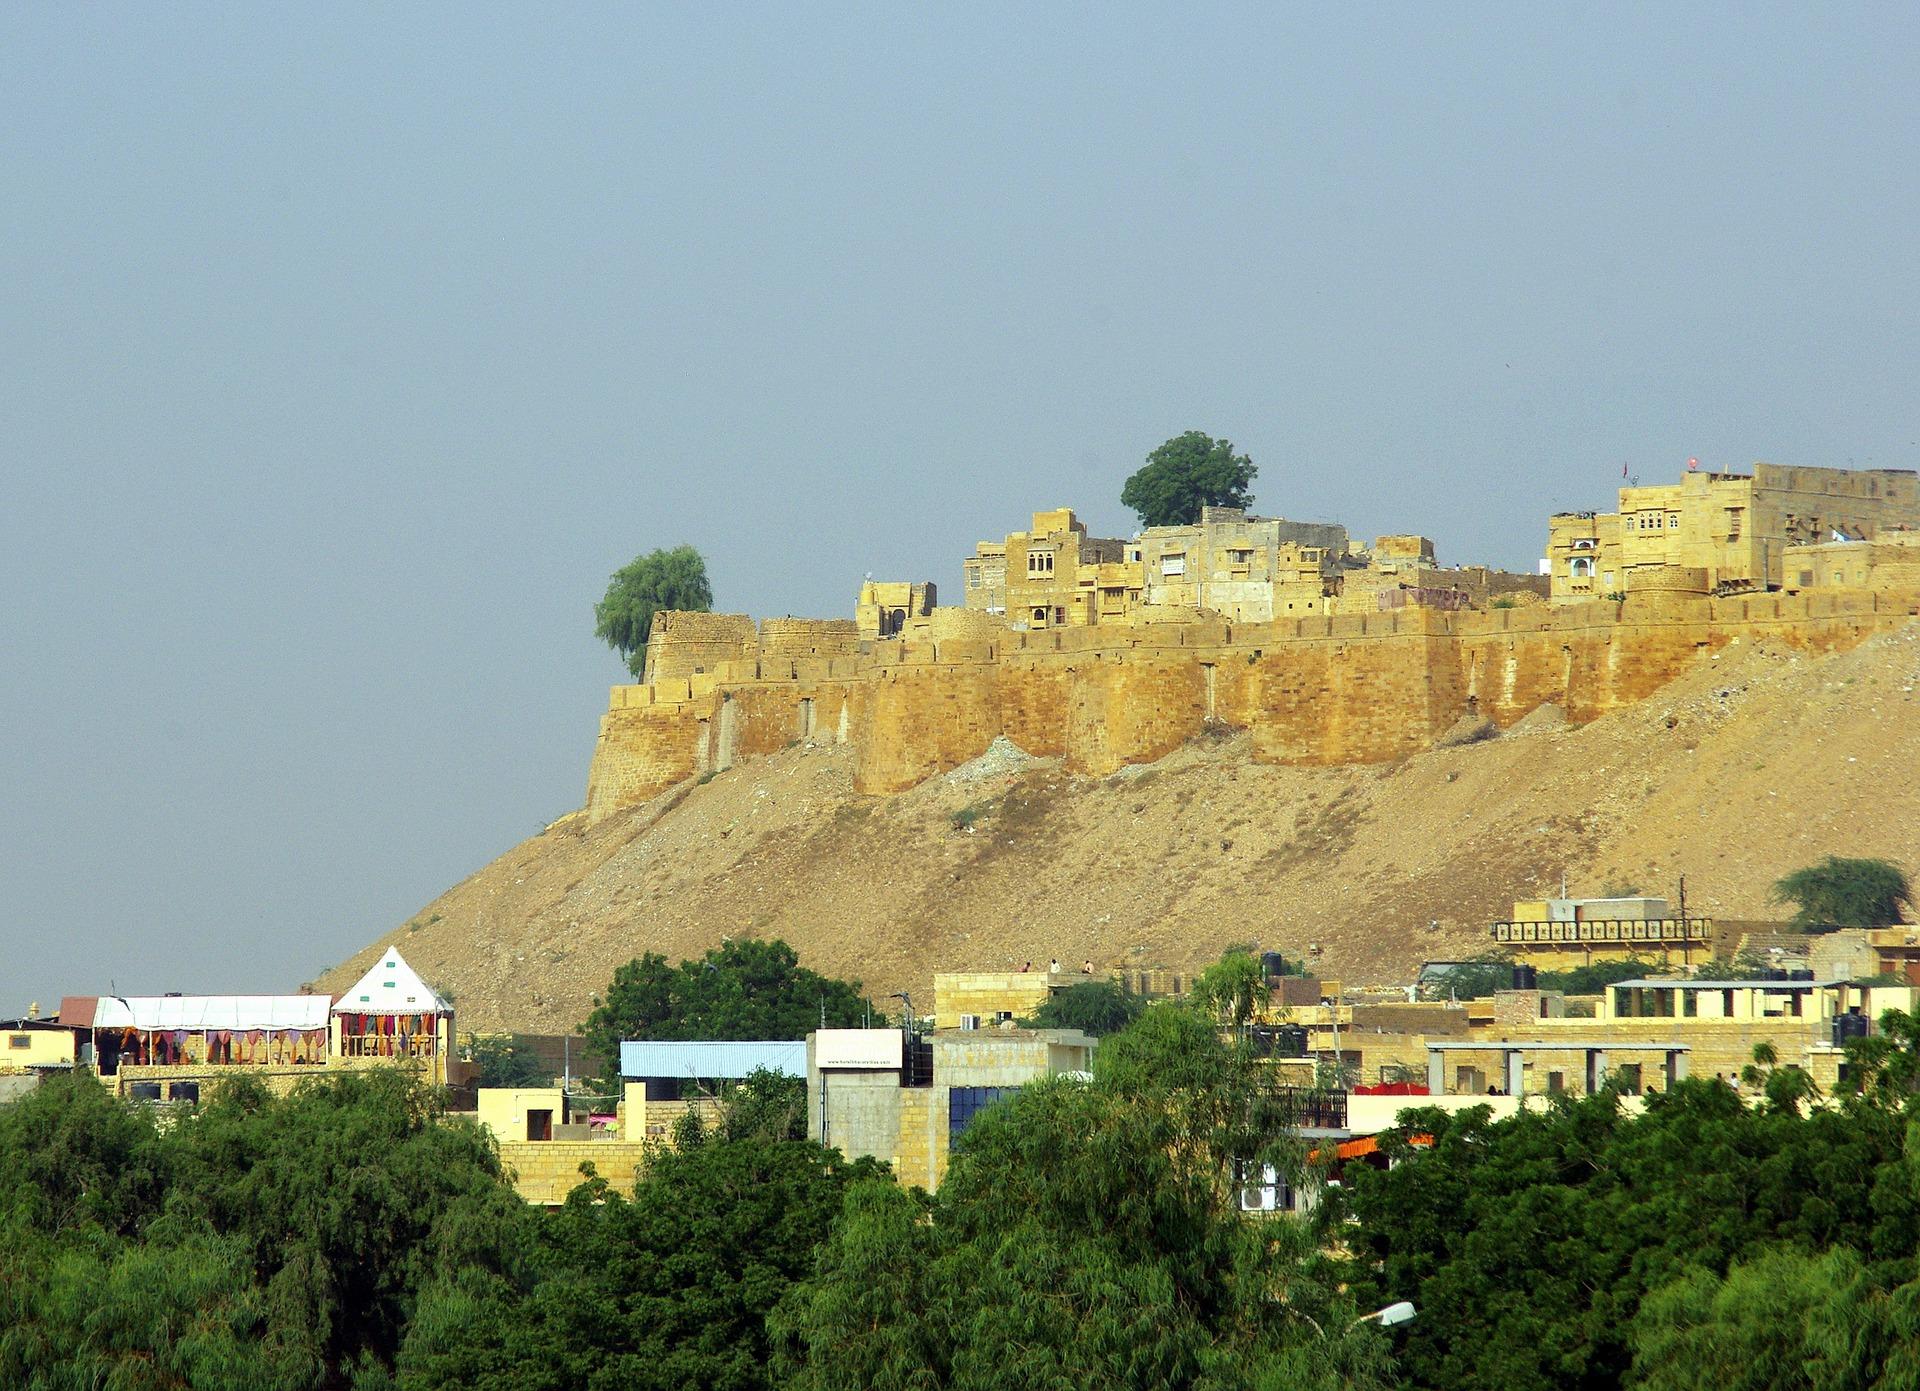 India's Royal Heritage - Jaisalmer Fort, India